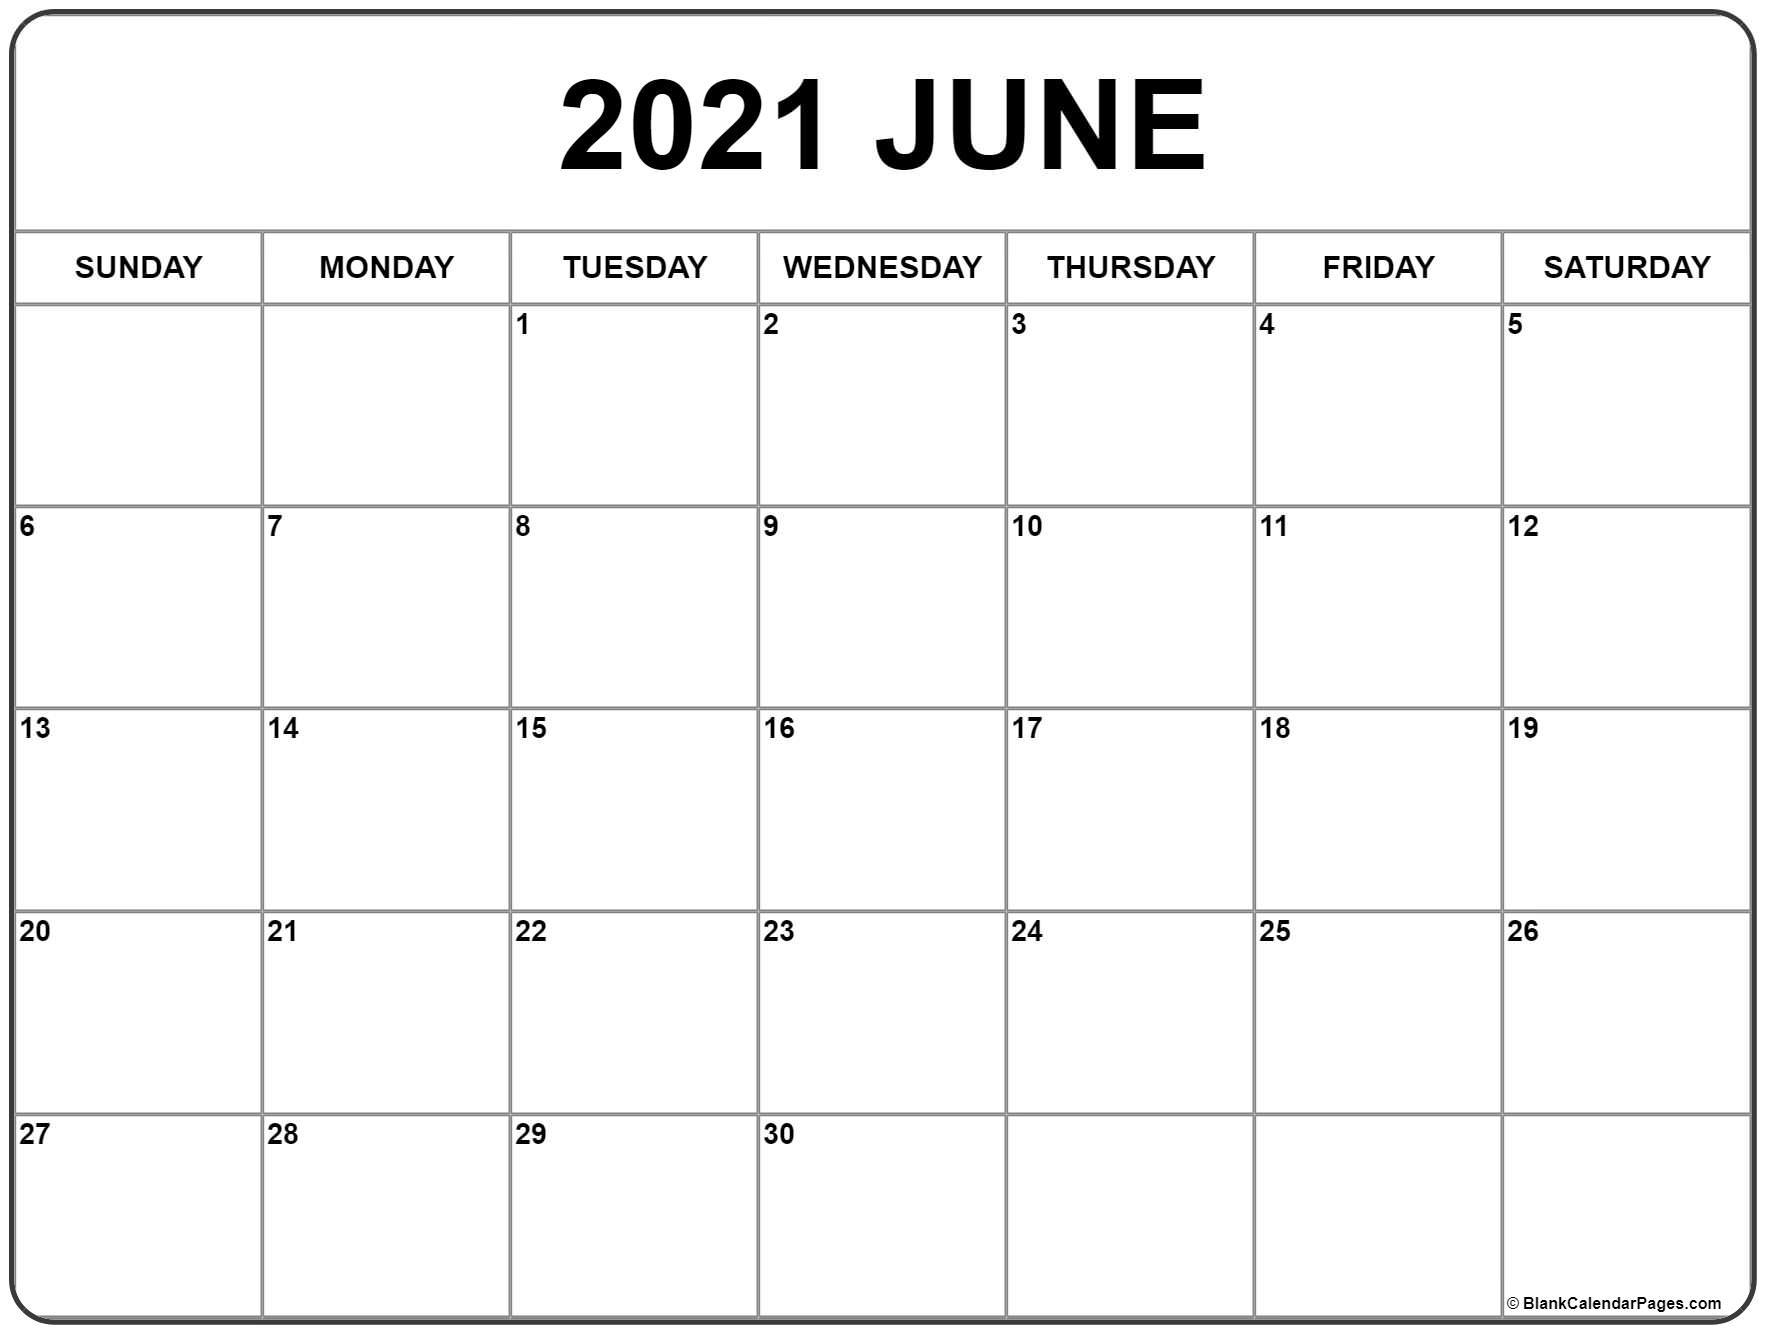 June 2021 Calendar | Free Printable Monthly Calendars with Printable Pocket Size Calendar 2021